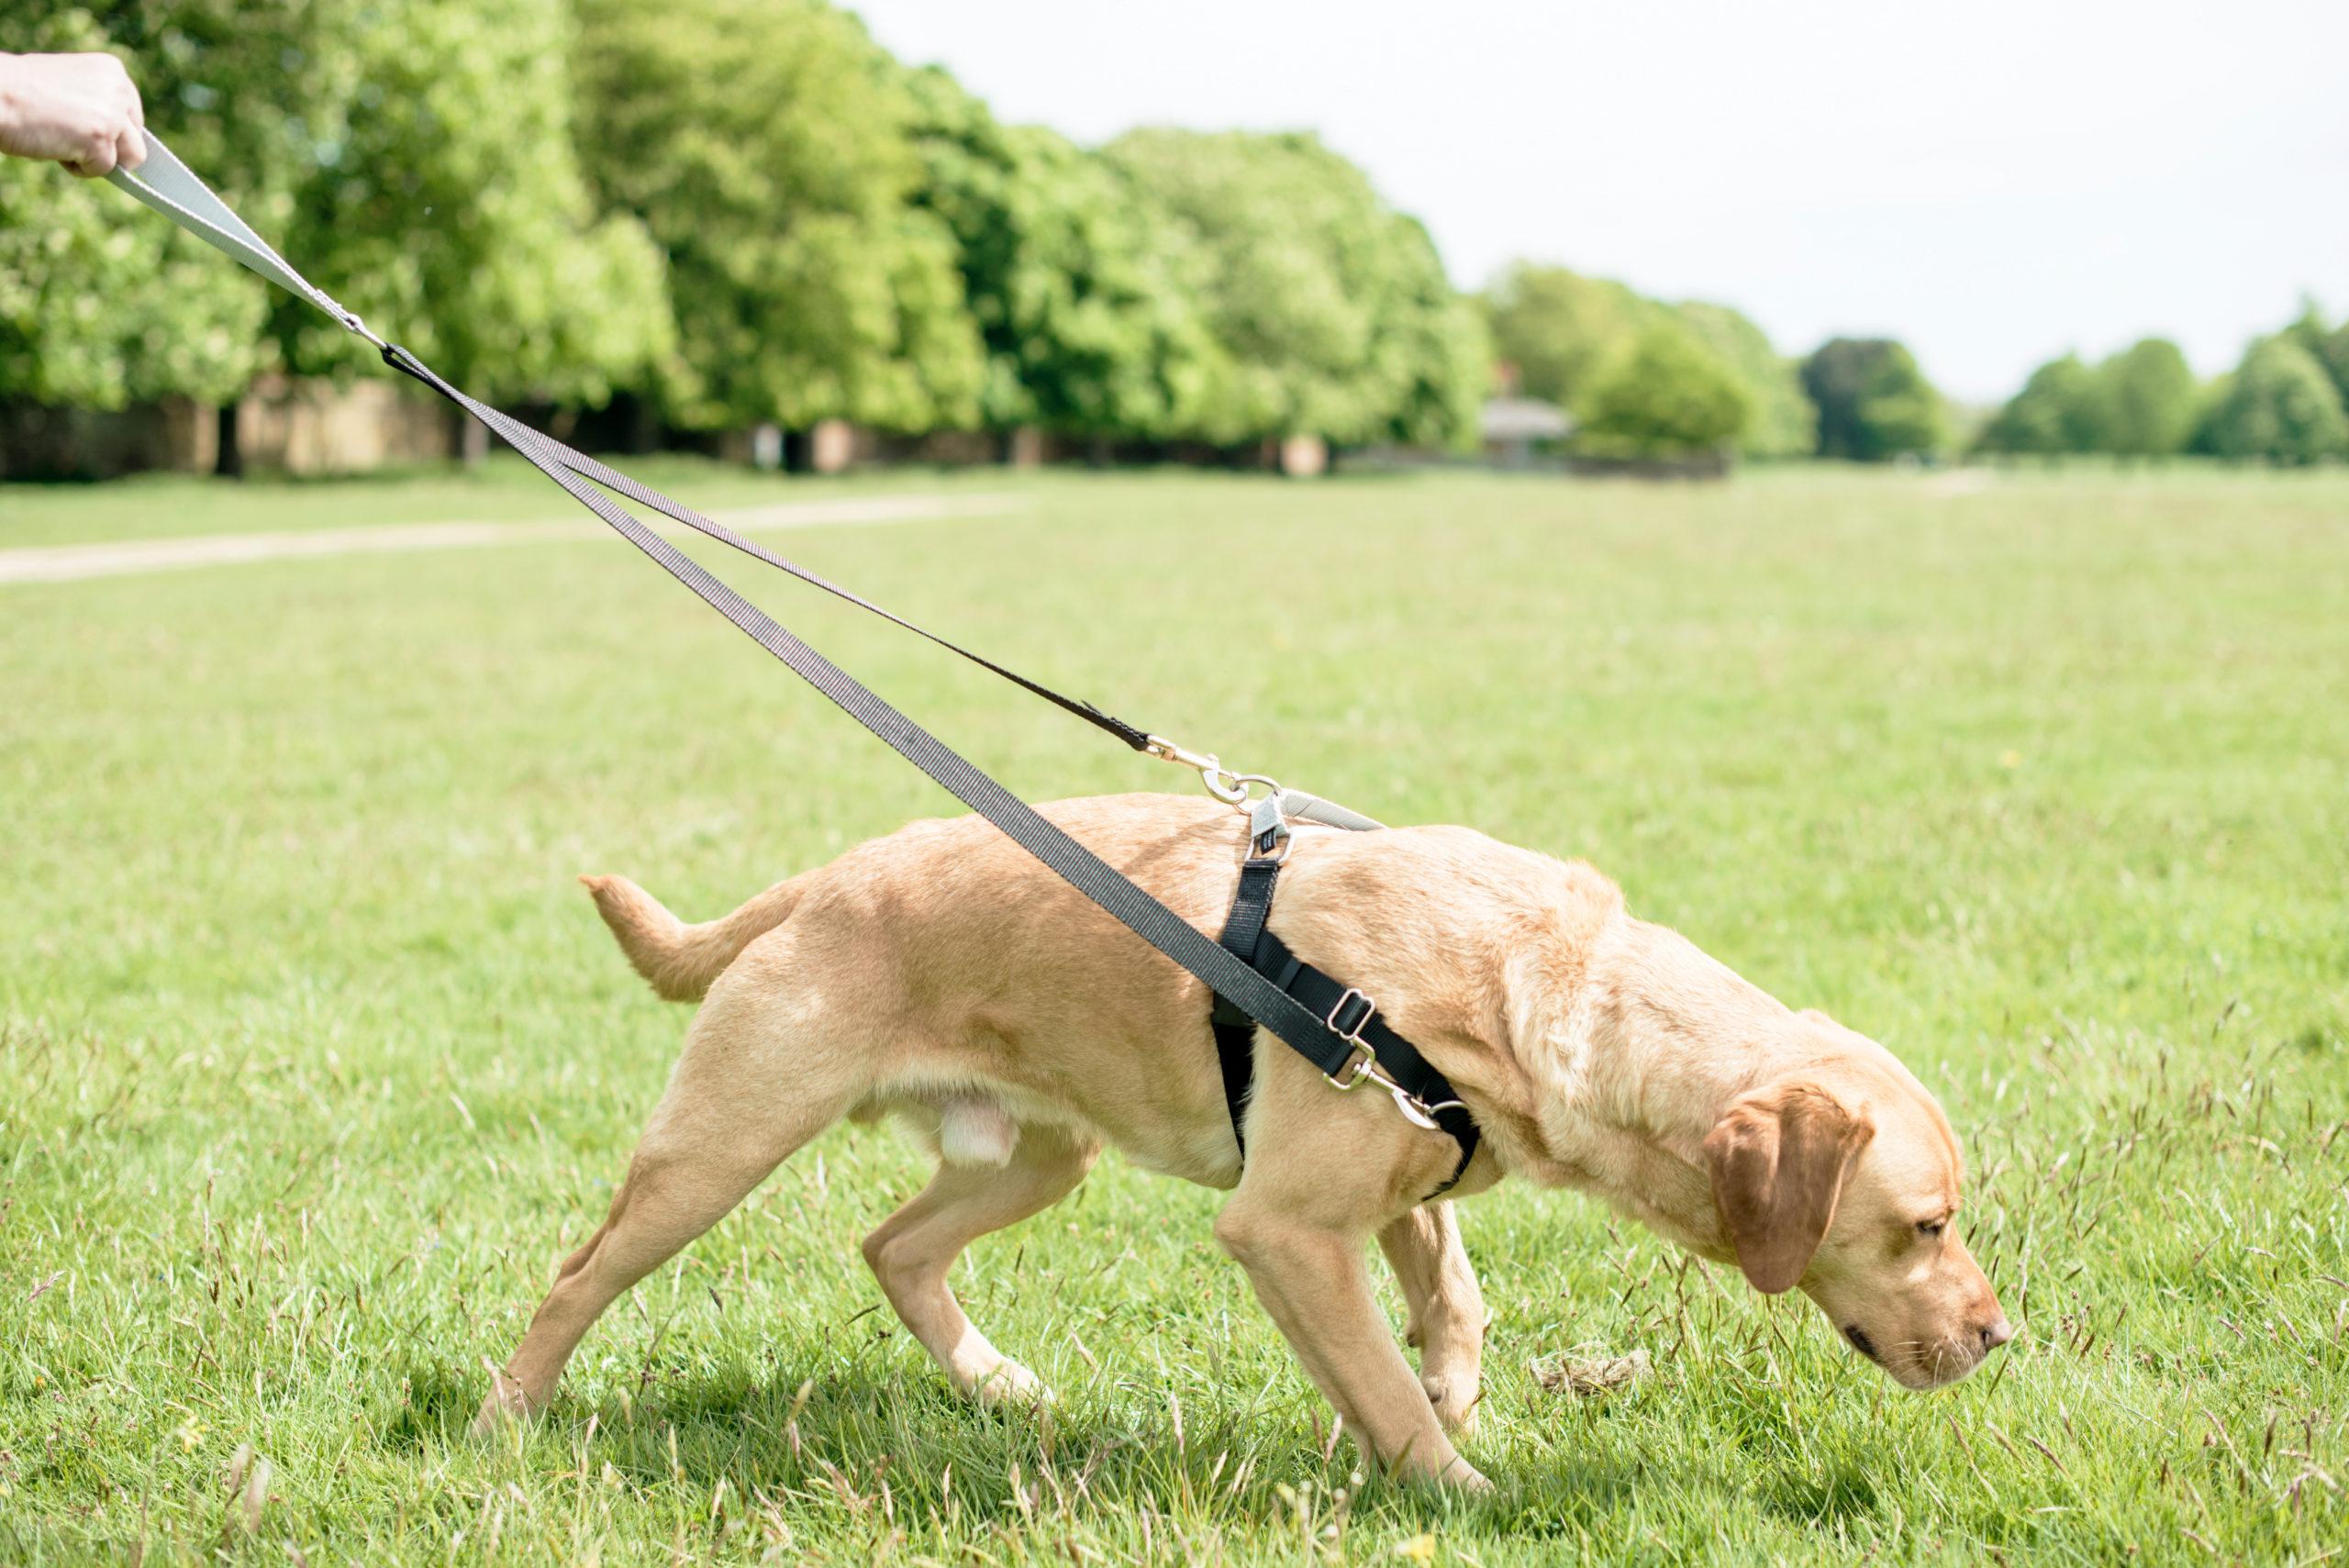 dog pulling on harness